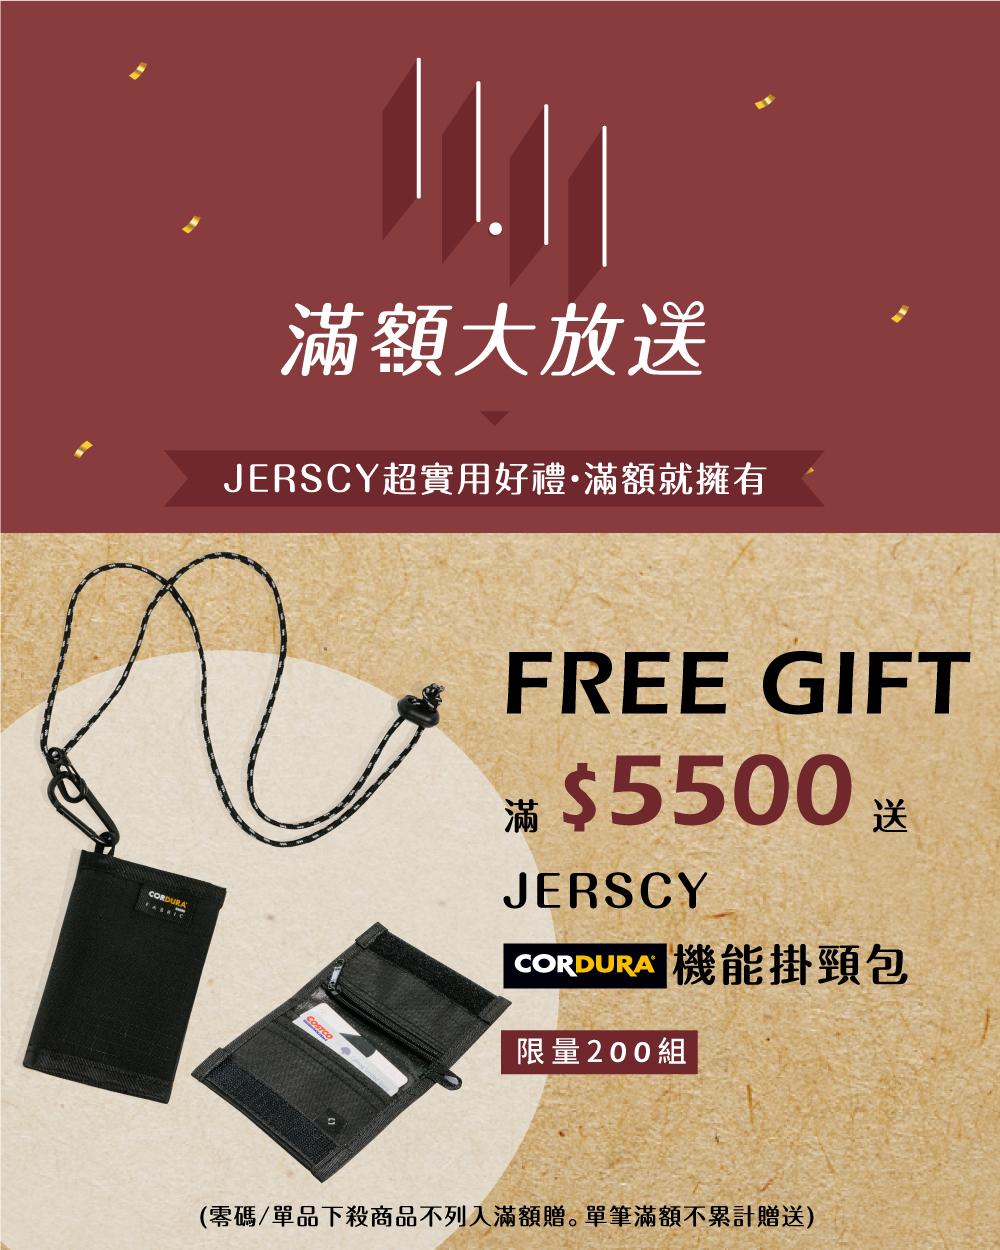 jerscy,最新商品,滿額好禮,1111購物節